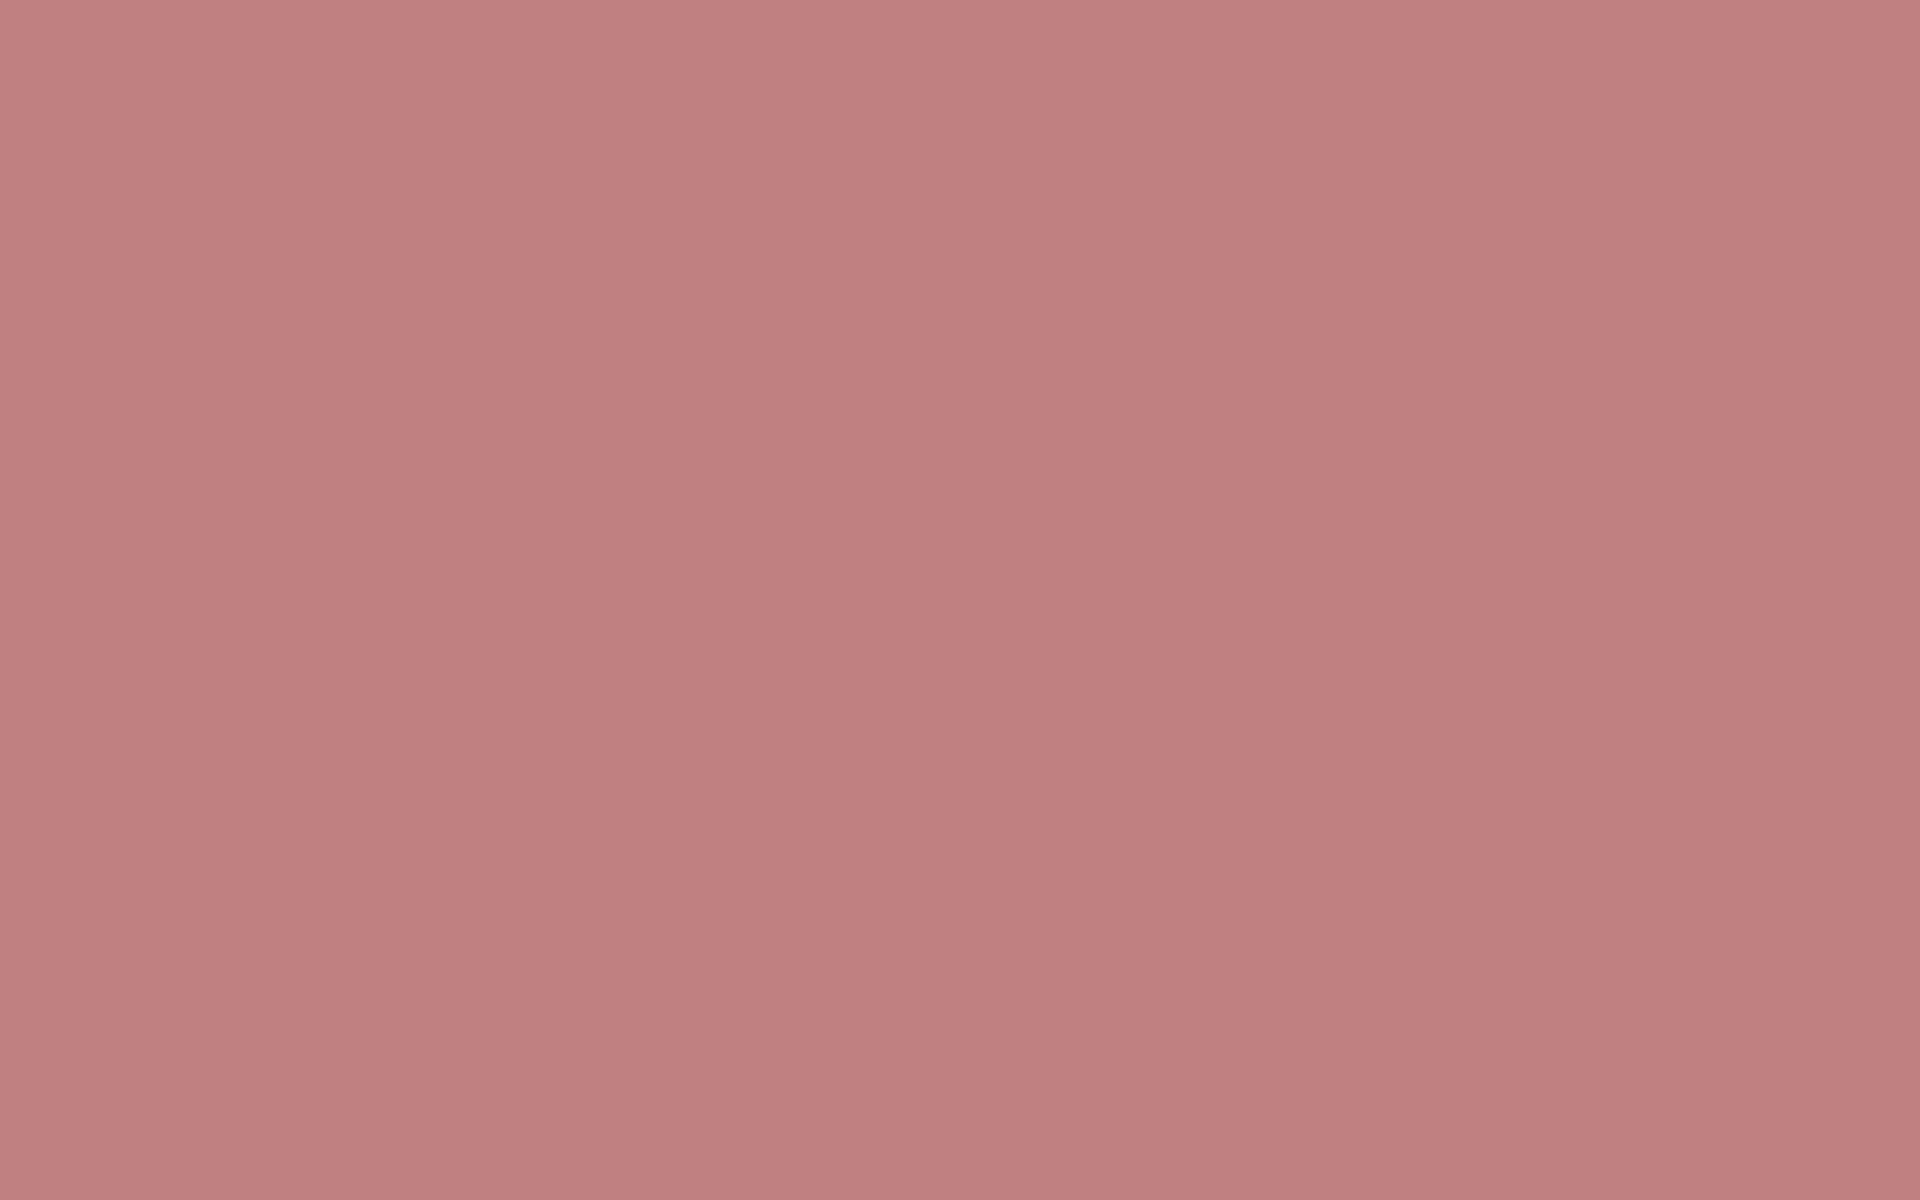 1920x1200 Old Rose Solid Color Background